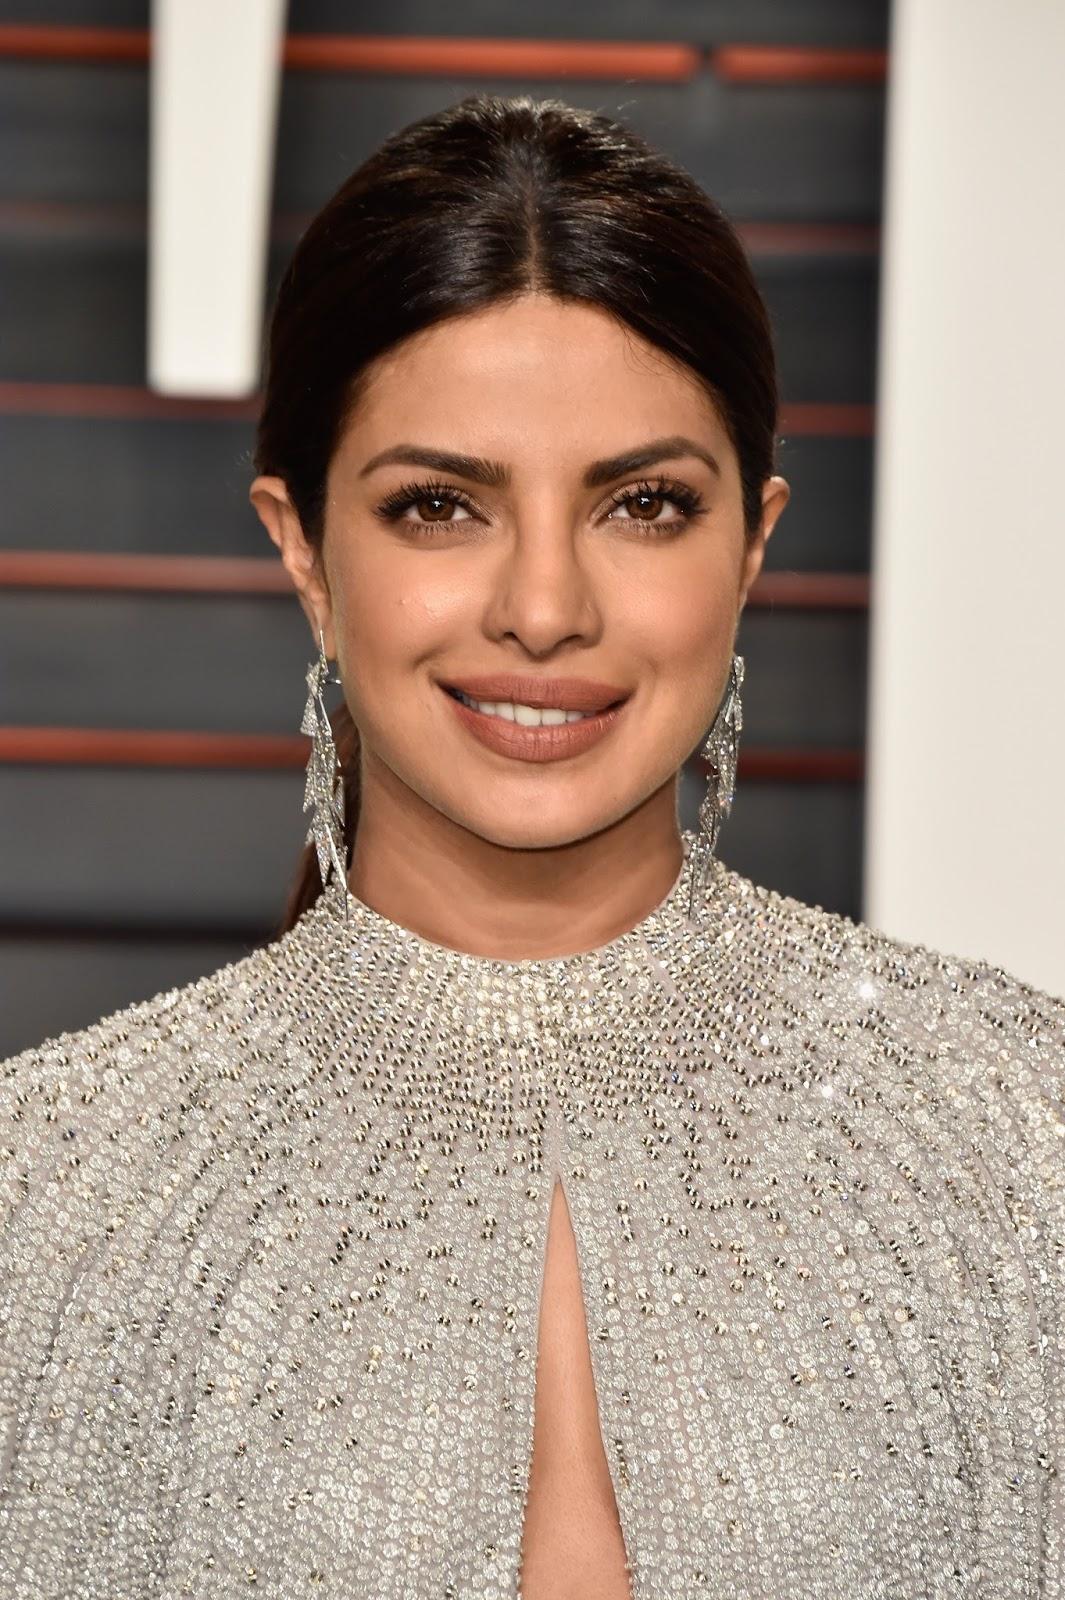 High Quality Bollywood Celebrity Pictures Priyanka Chopra -4074